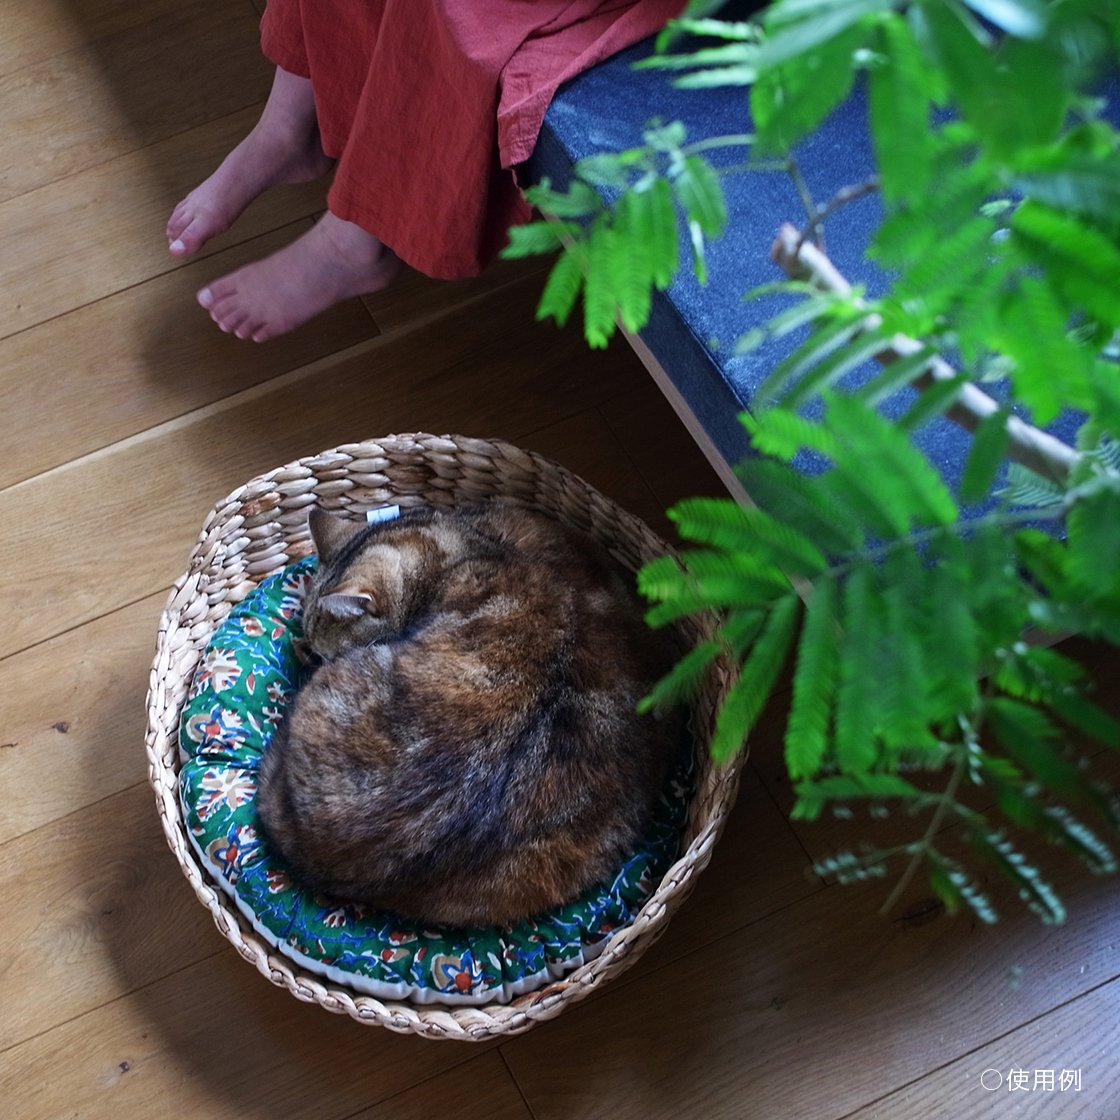 OZABUクッション-Lサイズ【ウスカーキ×ウスベージュ】 /For Cat